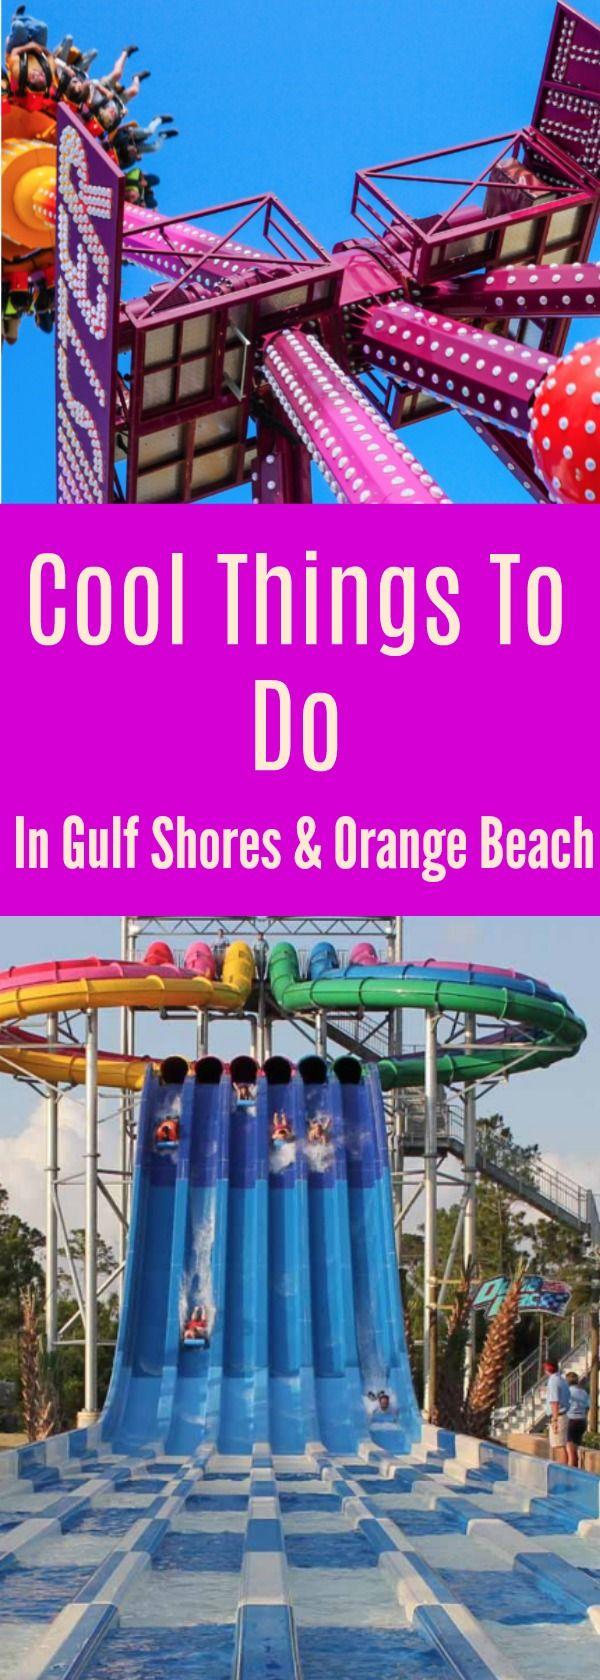 24 Hours In Gulf Shores & Orange Beach Alabama Image By